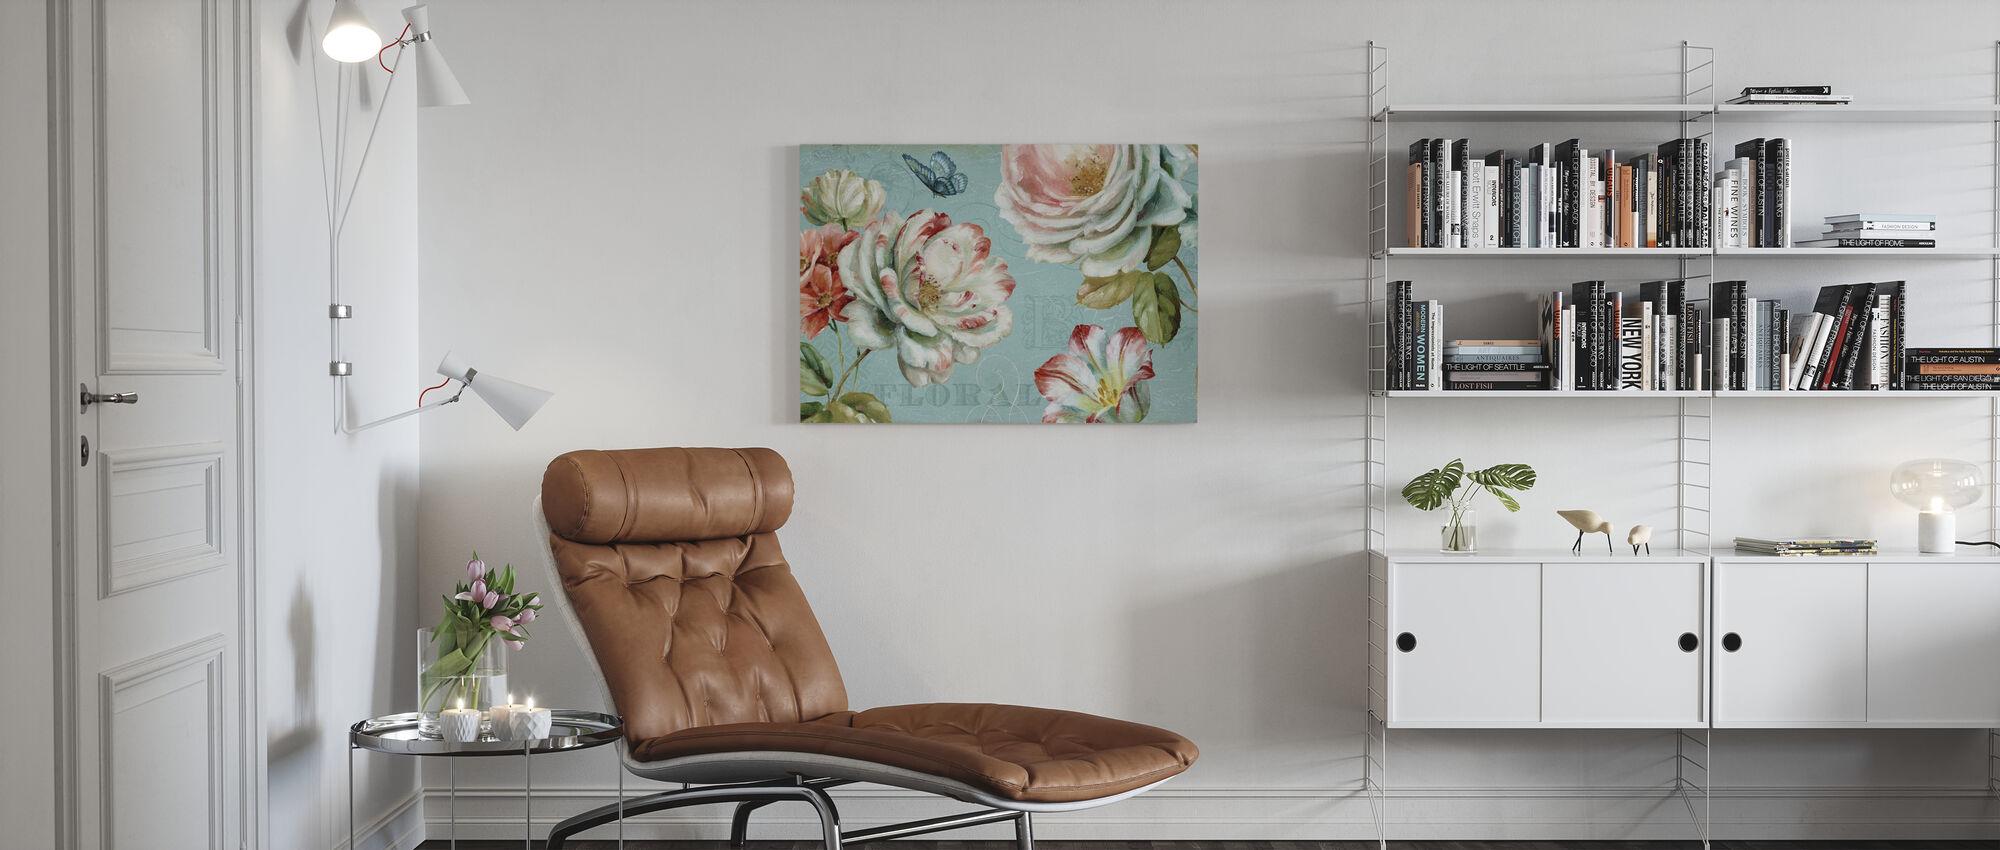 Frühlingsromantik - Leinwandbild - Wohnzimmer